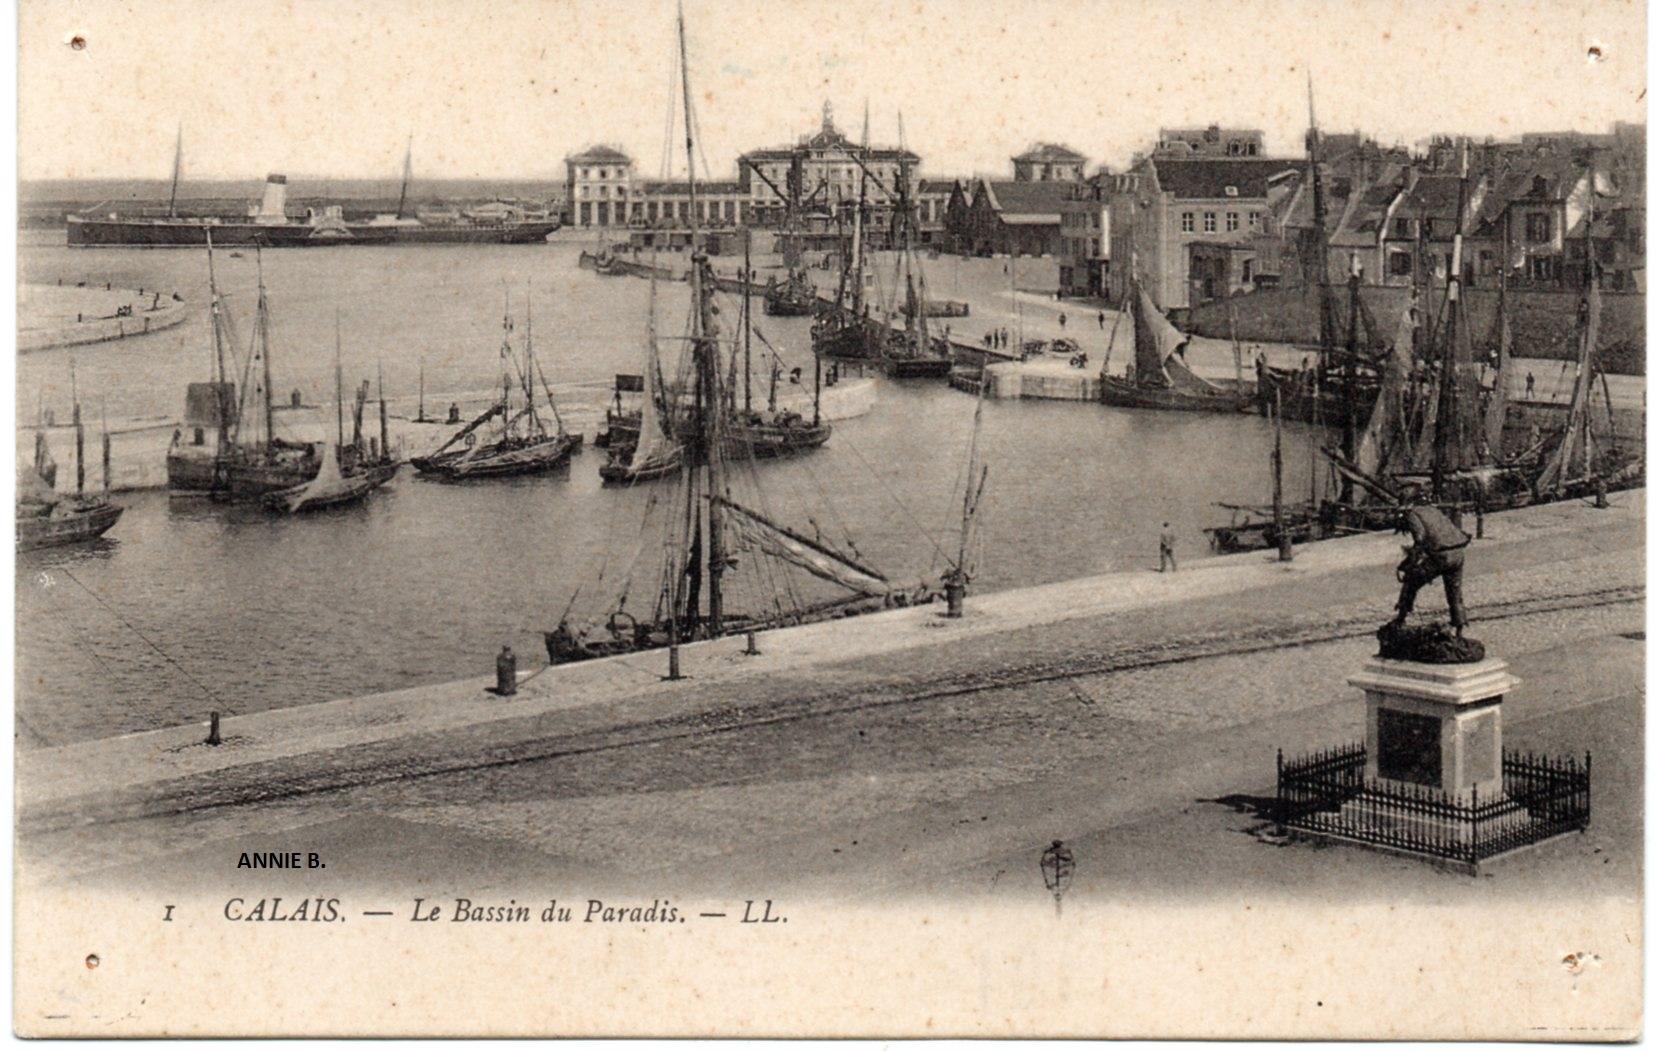 Rétro, Courgain maritime de Calais